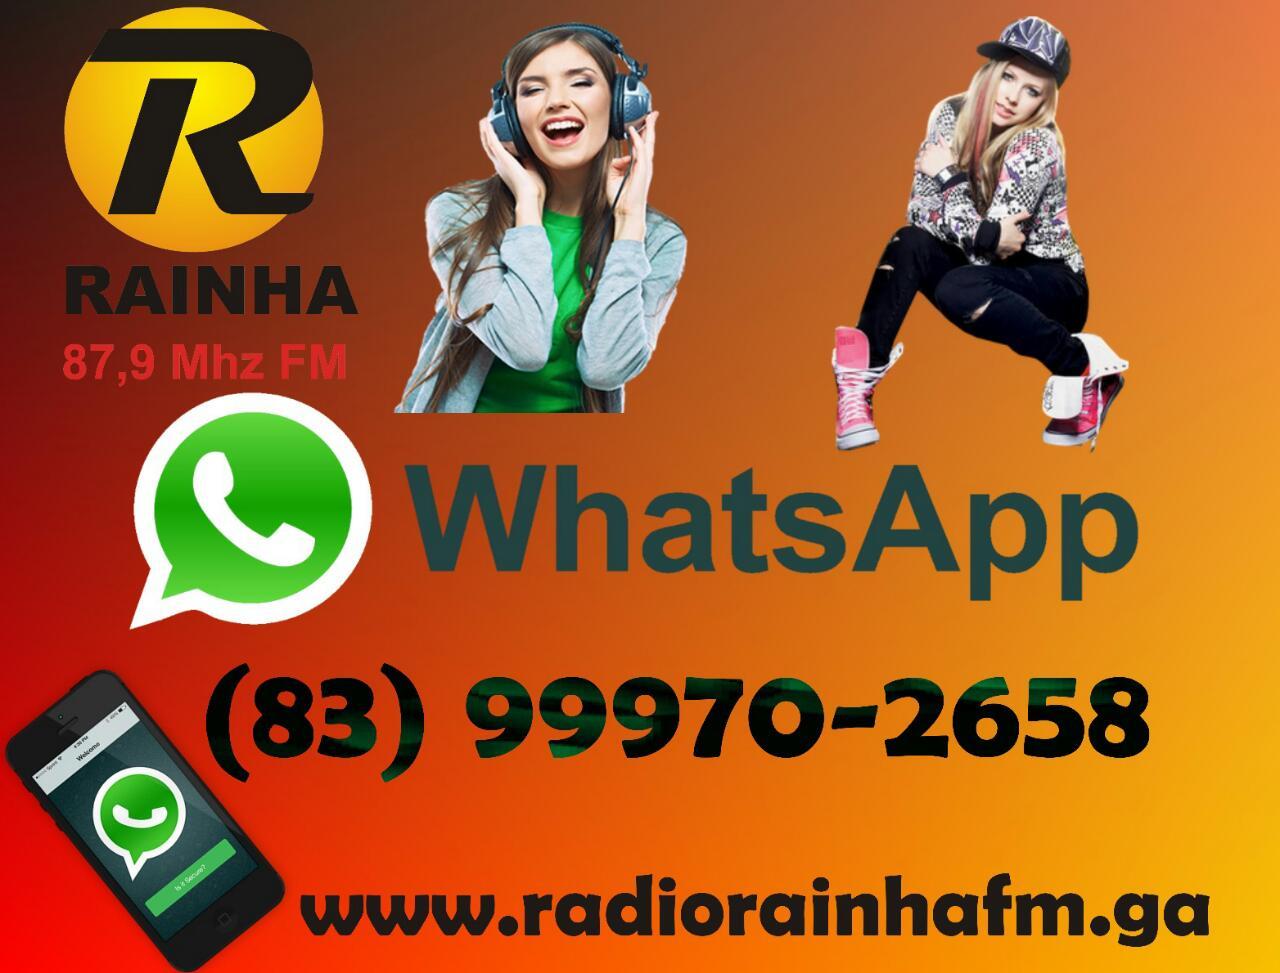 RÁDIO RAINHA FM 87,9 - ITABAIANA/PB